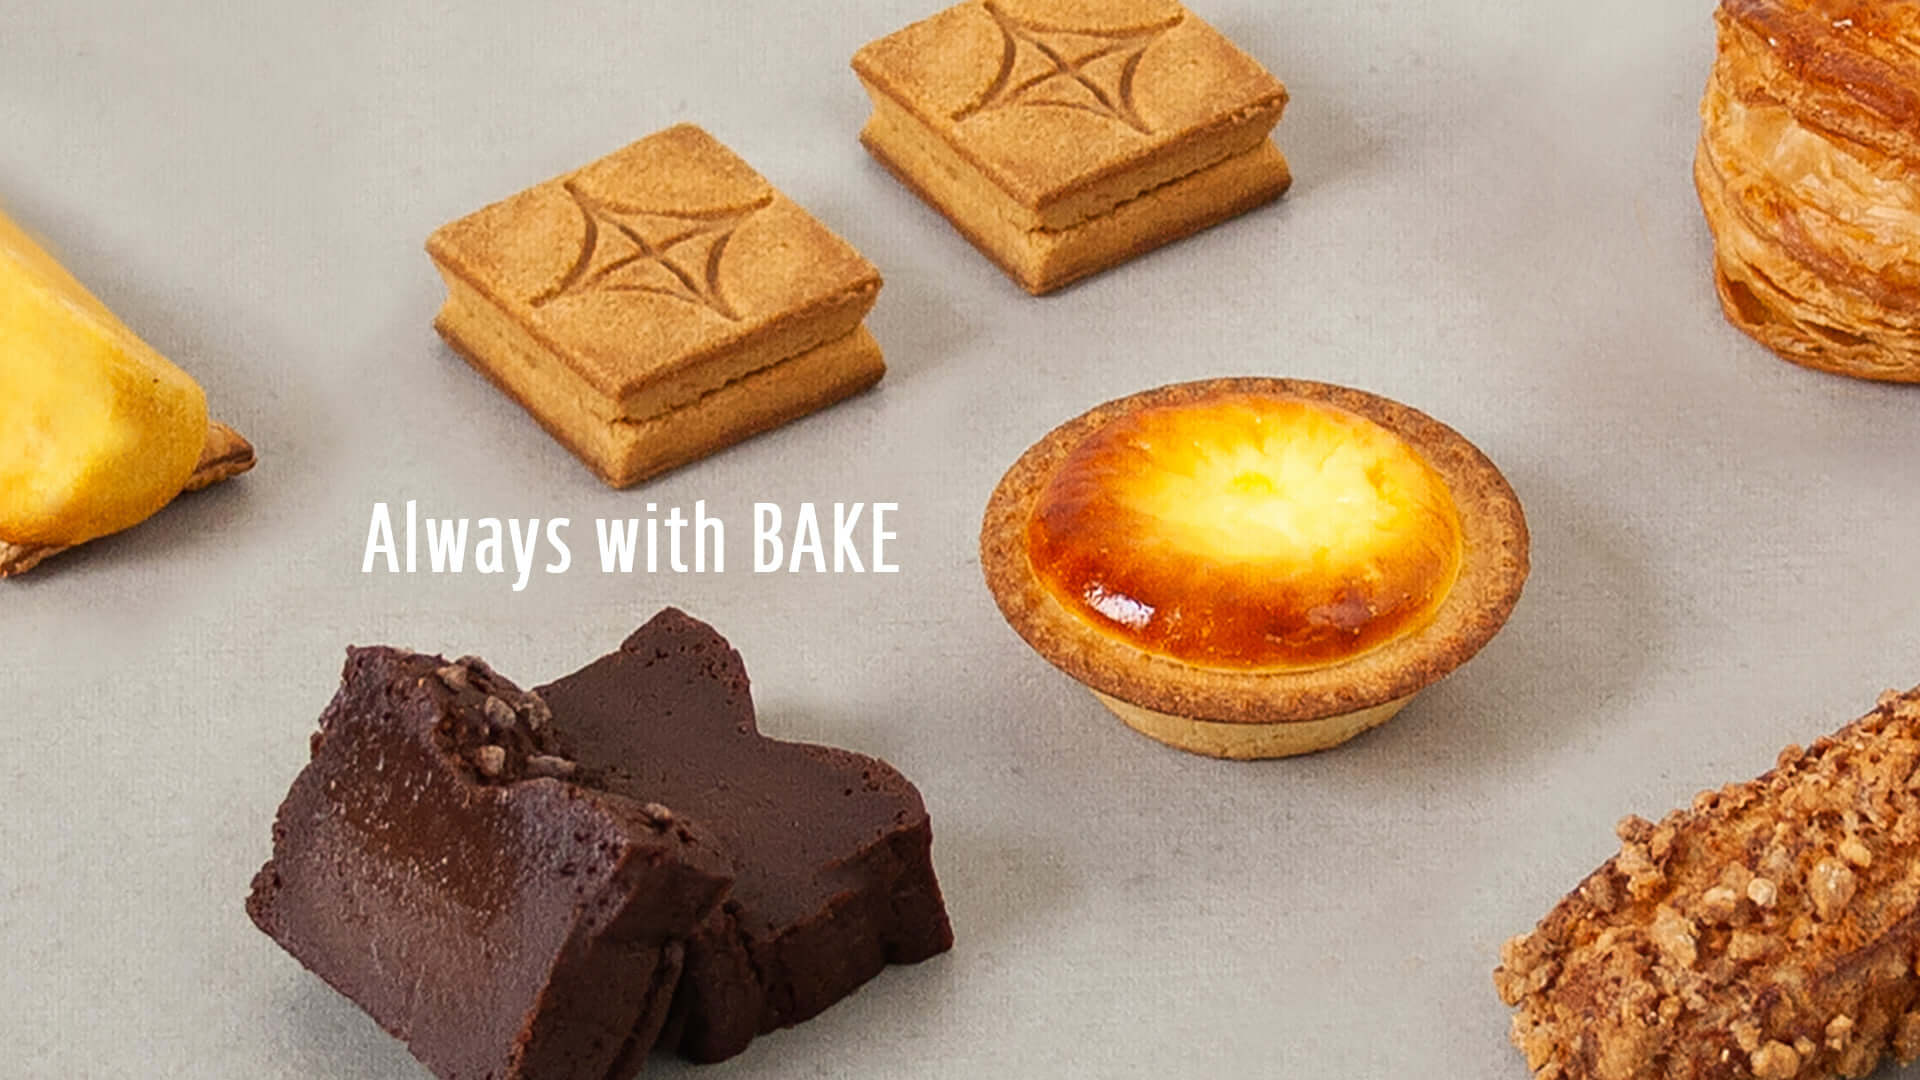 BAKE初の公式オンラインショップ「BAKE THE ONLINE」がオープン!チーズタルト10P BOXが50%OFFの特別価格に gourmet_bake_online_06-1920x1080